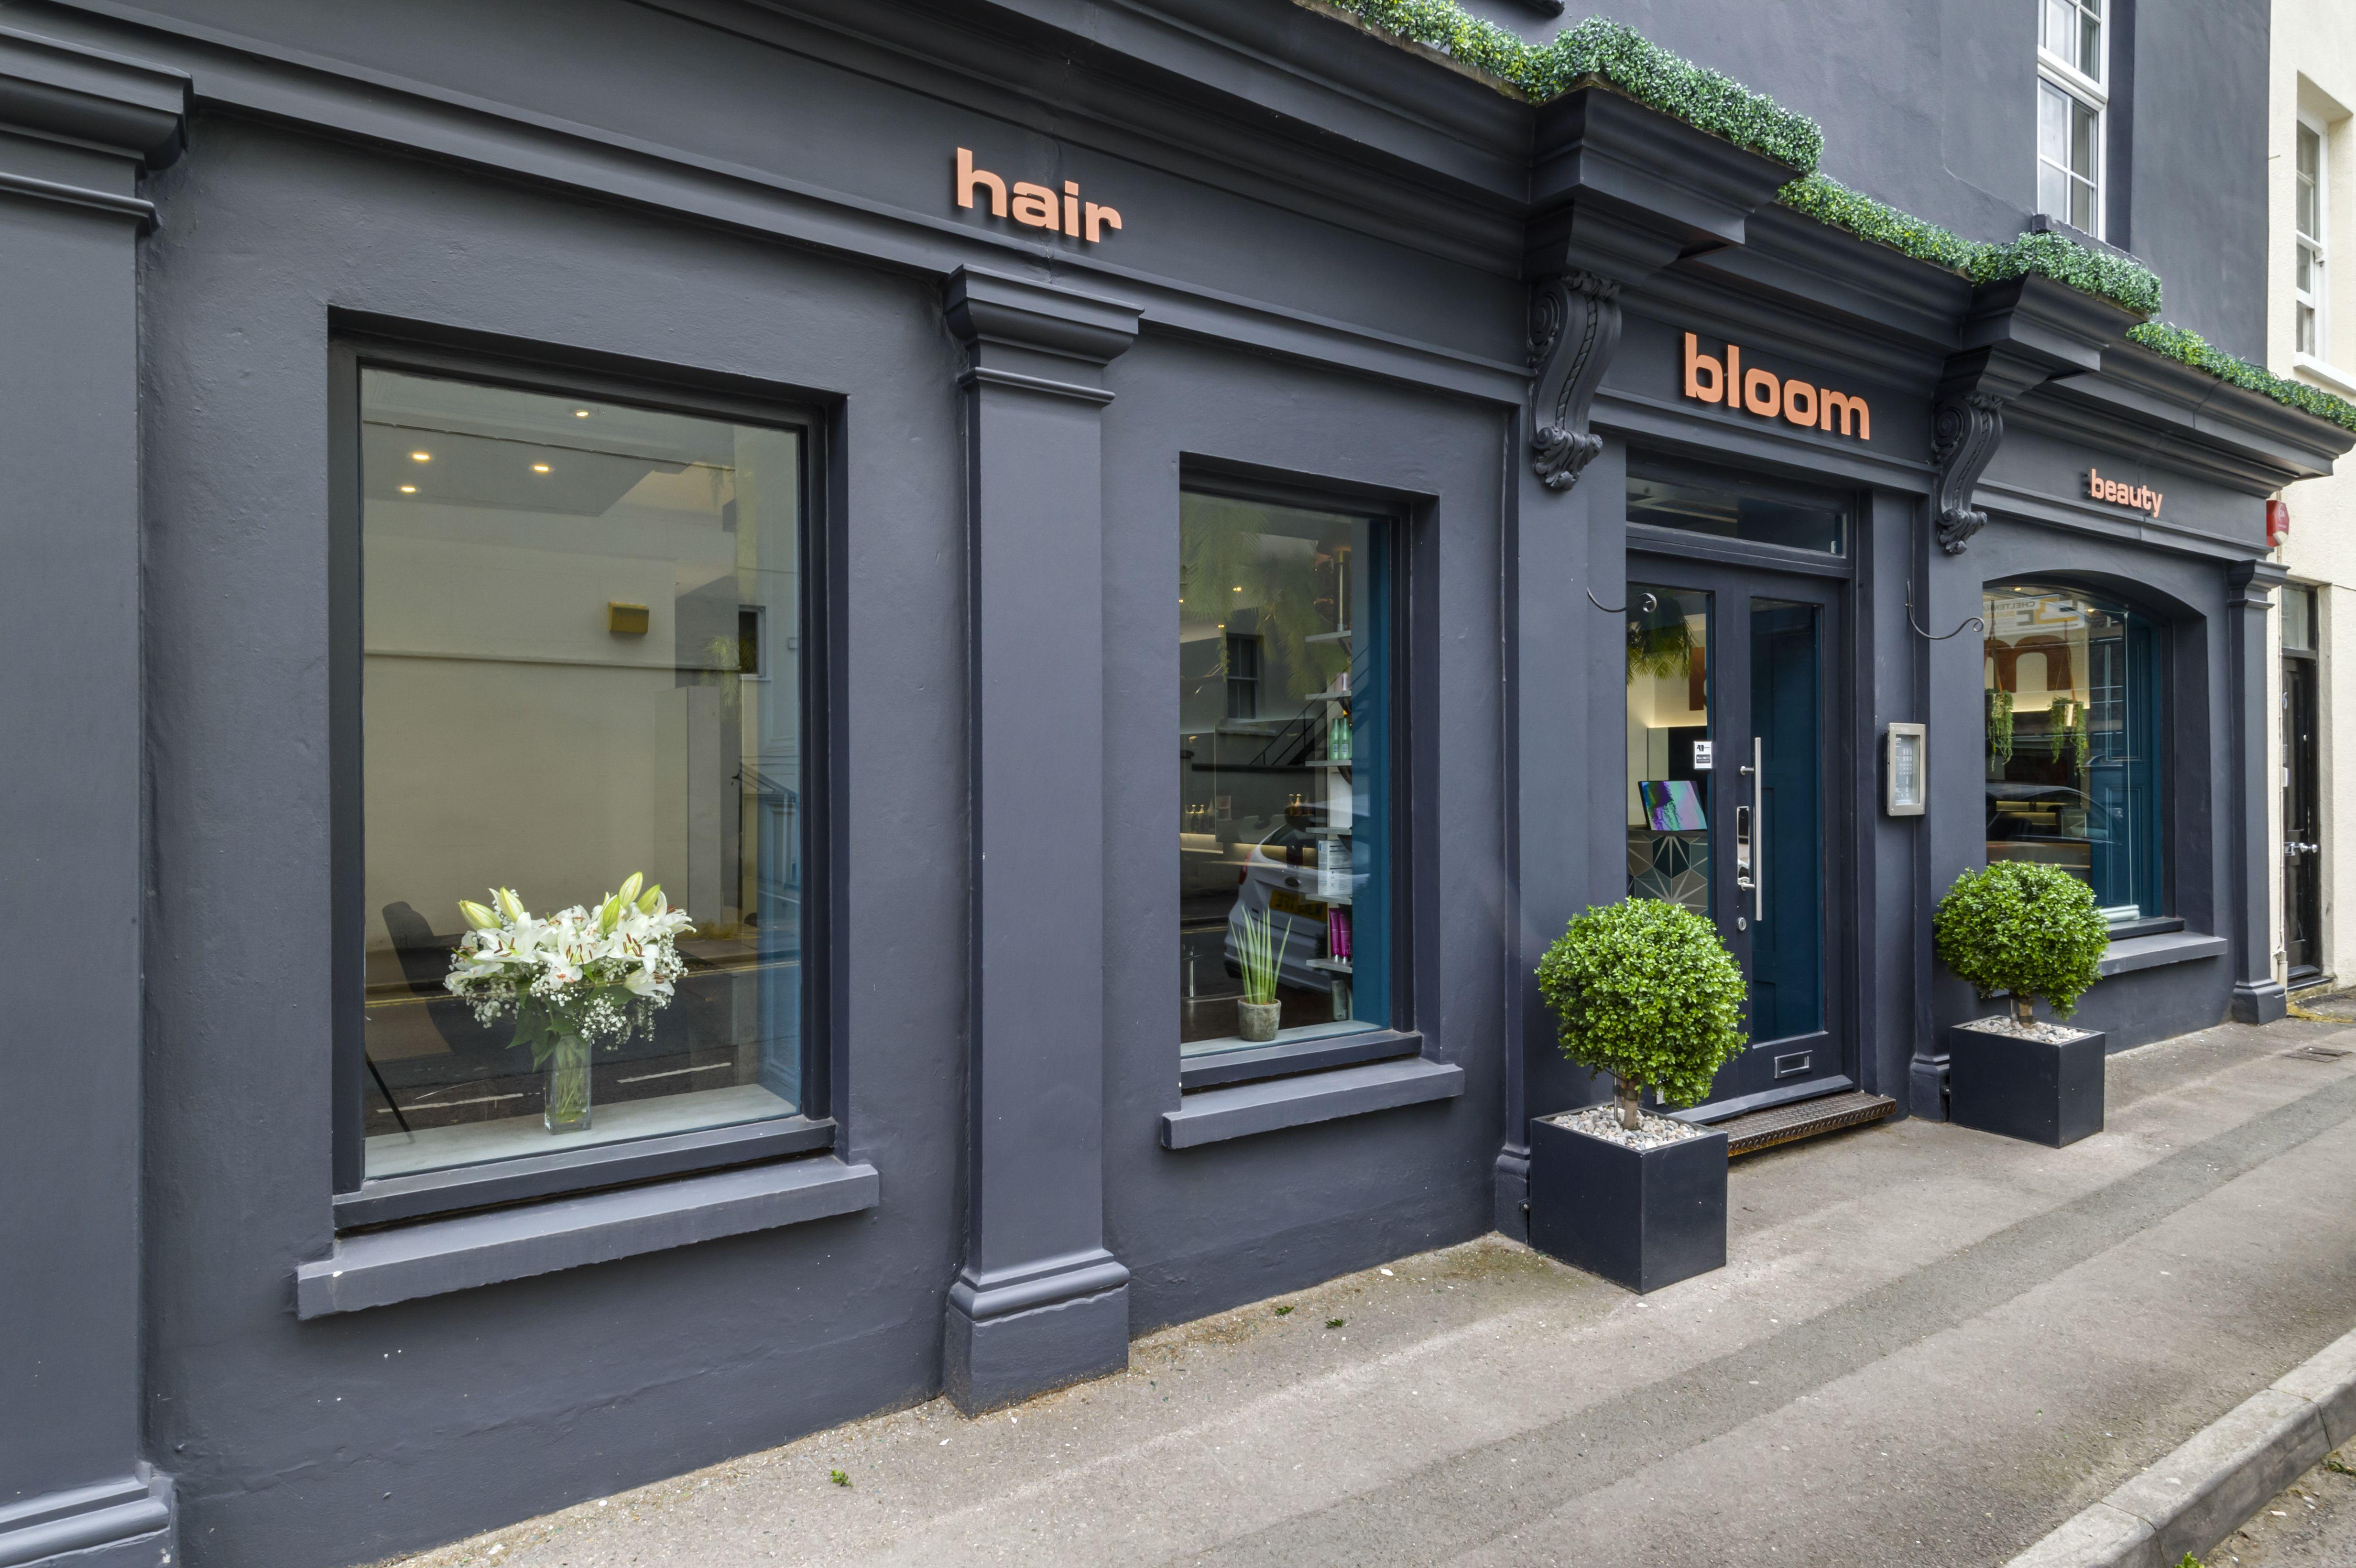 Bloom hair and beauty Salon Exterior Cheltenham в 2020 г